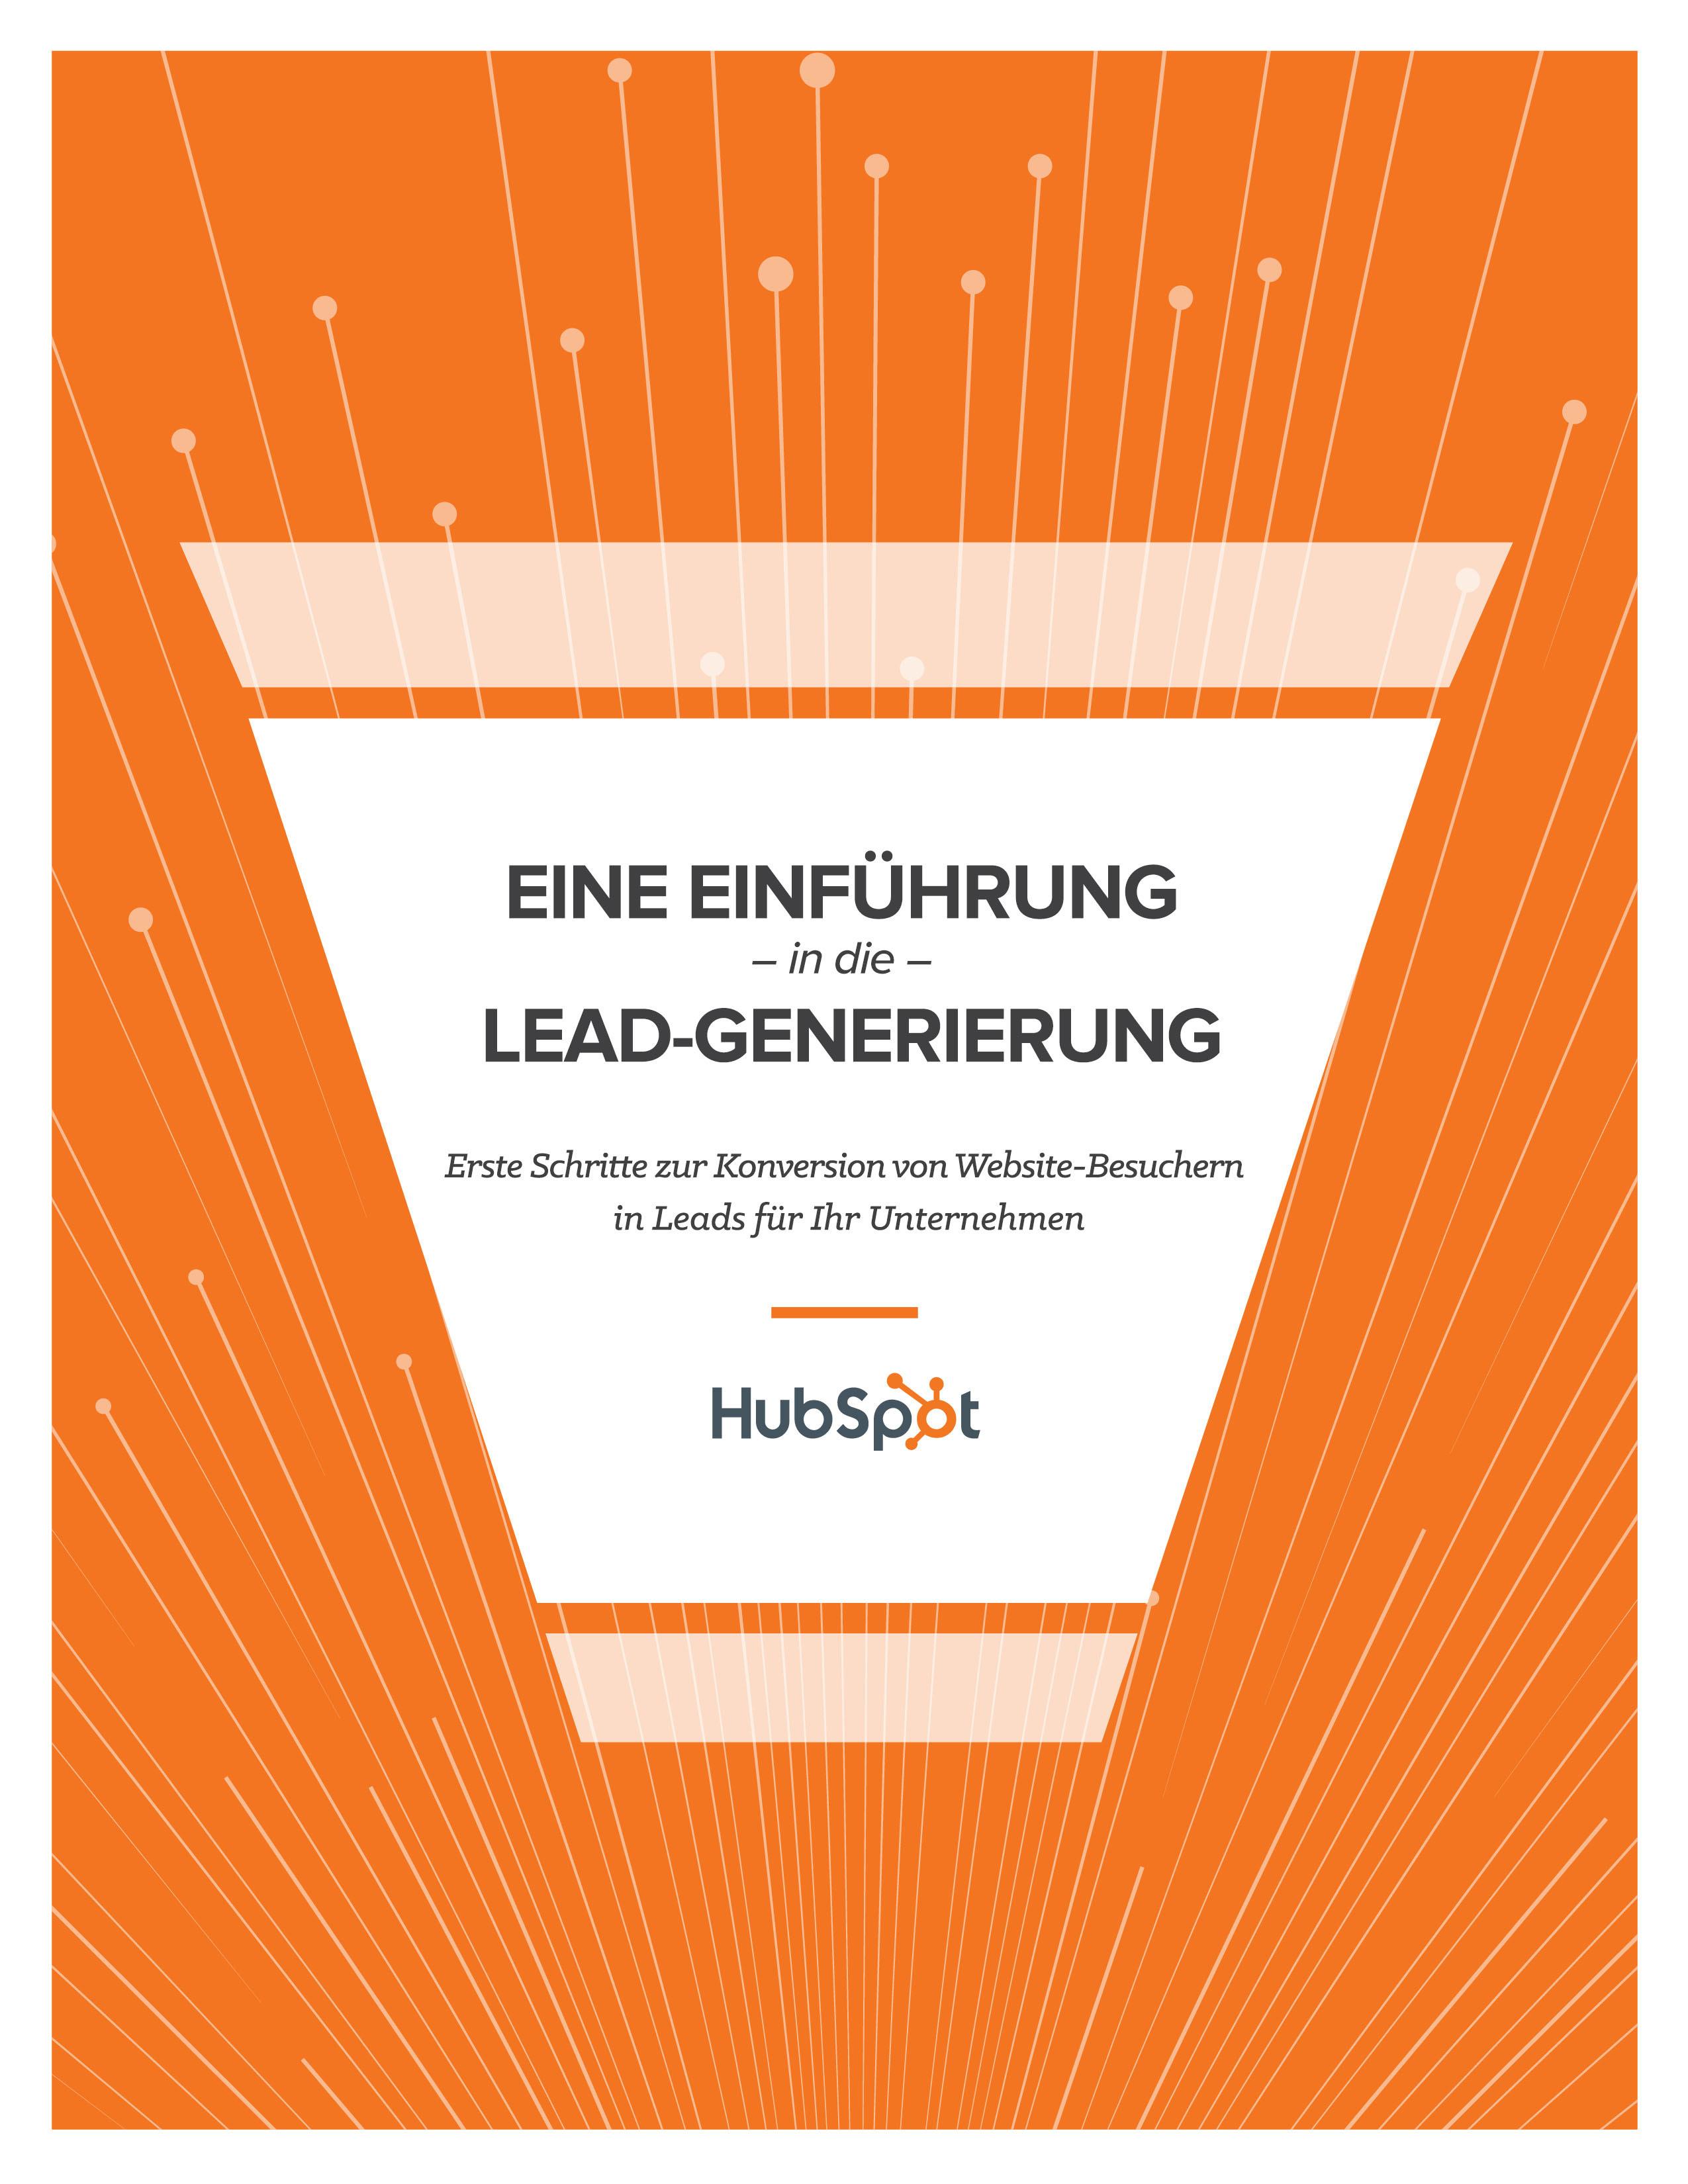 [E-Book]-Einfuehrung-in-die-Lead-Generierung_Page_01.png